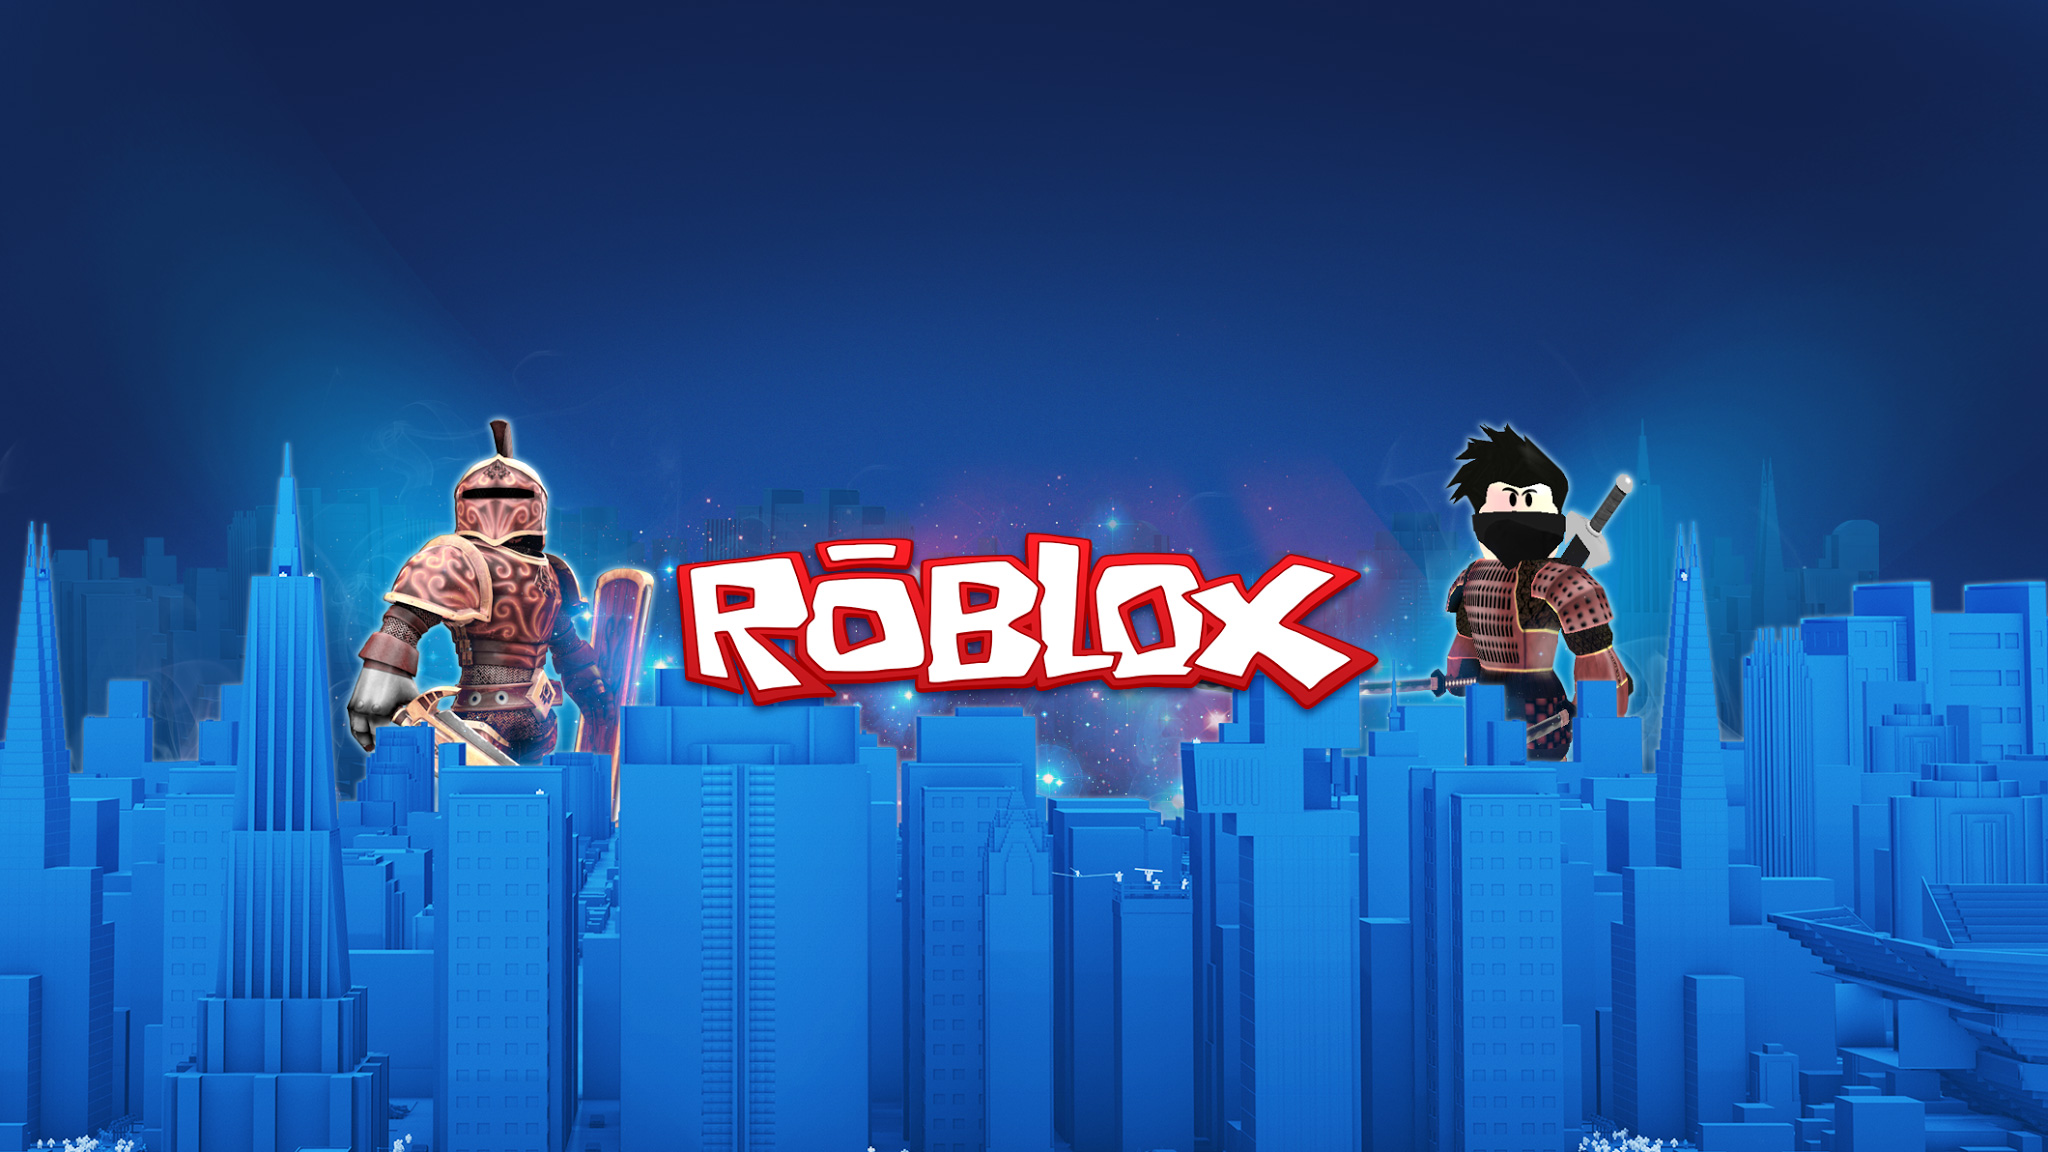 [50+] Make A ROBLOX Wallpaper on WallpaperSafari